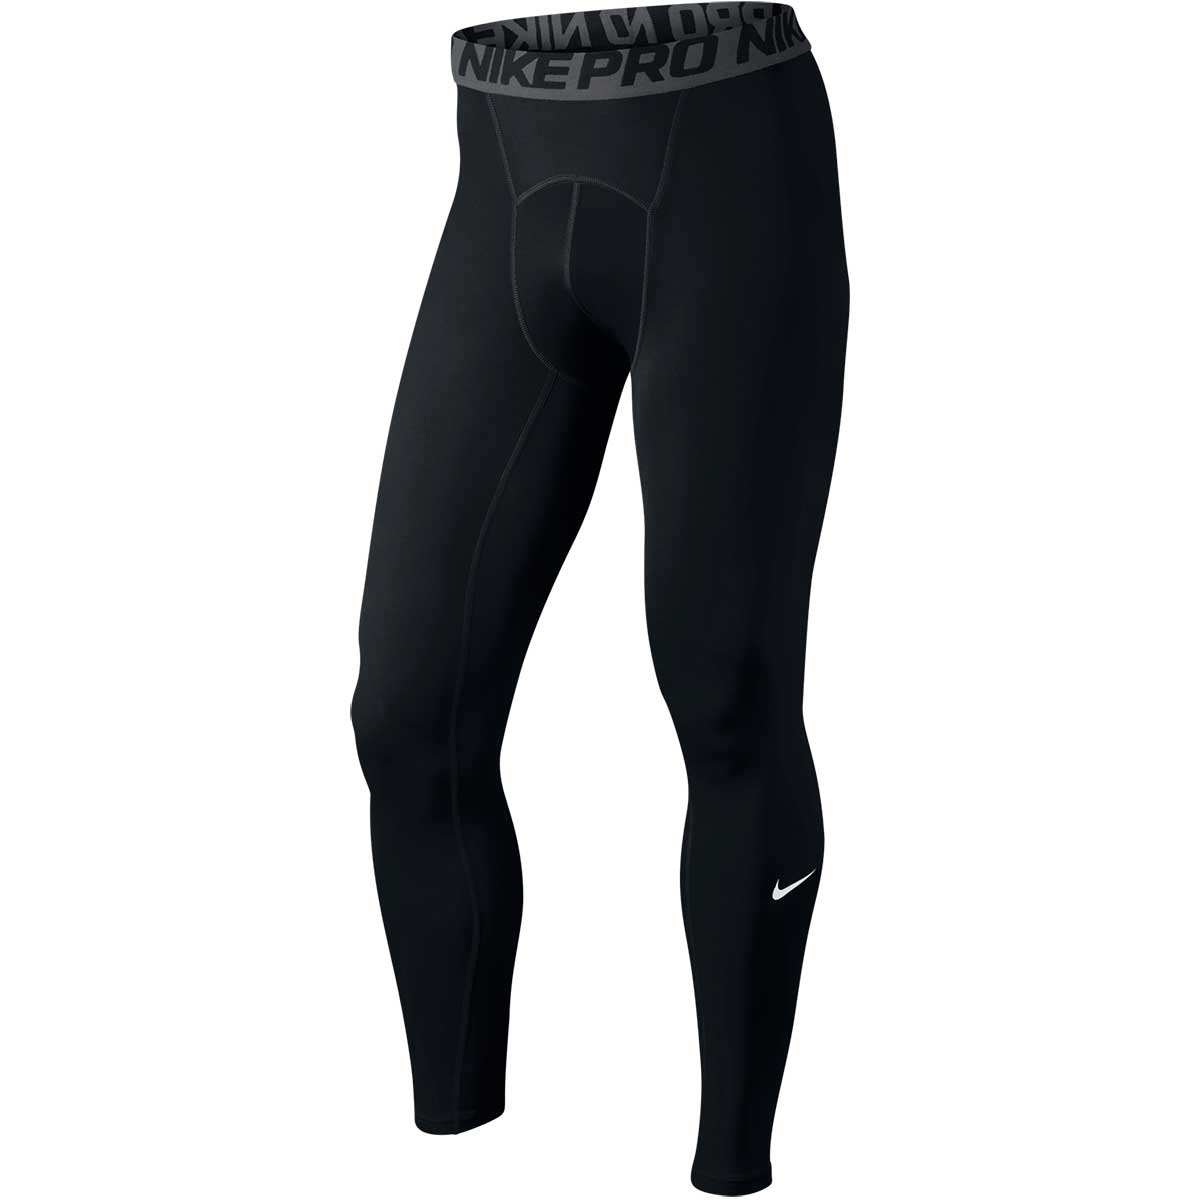 Nike Pro Combat Tights (Black)